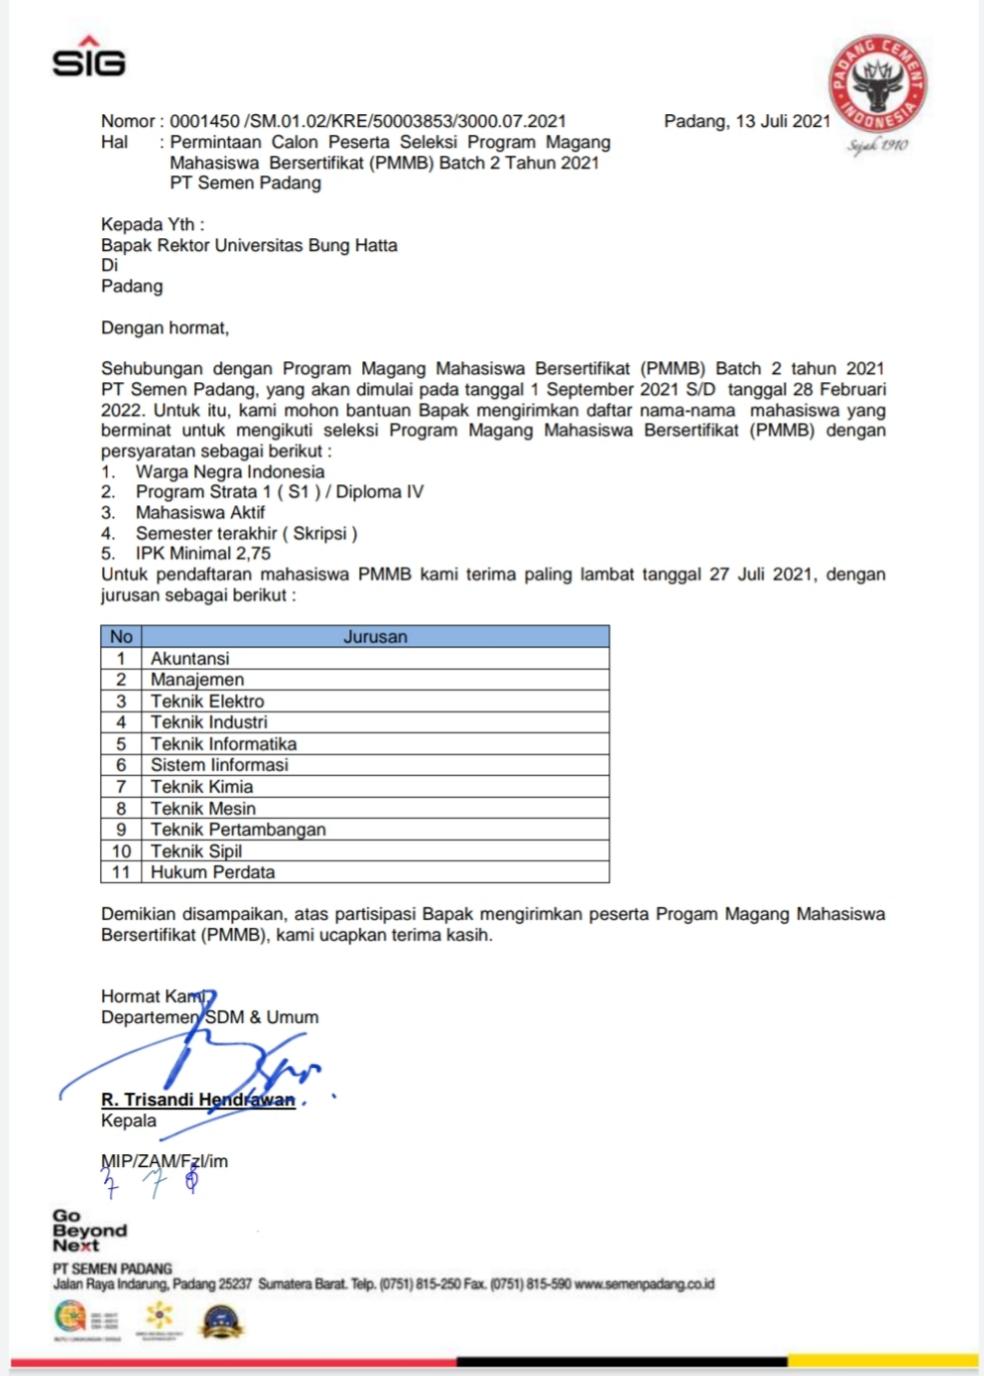 Daftarkan Diri Anda pada PMMB Batch II PT Semen Padang